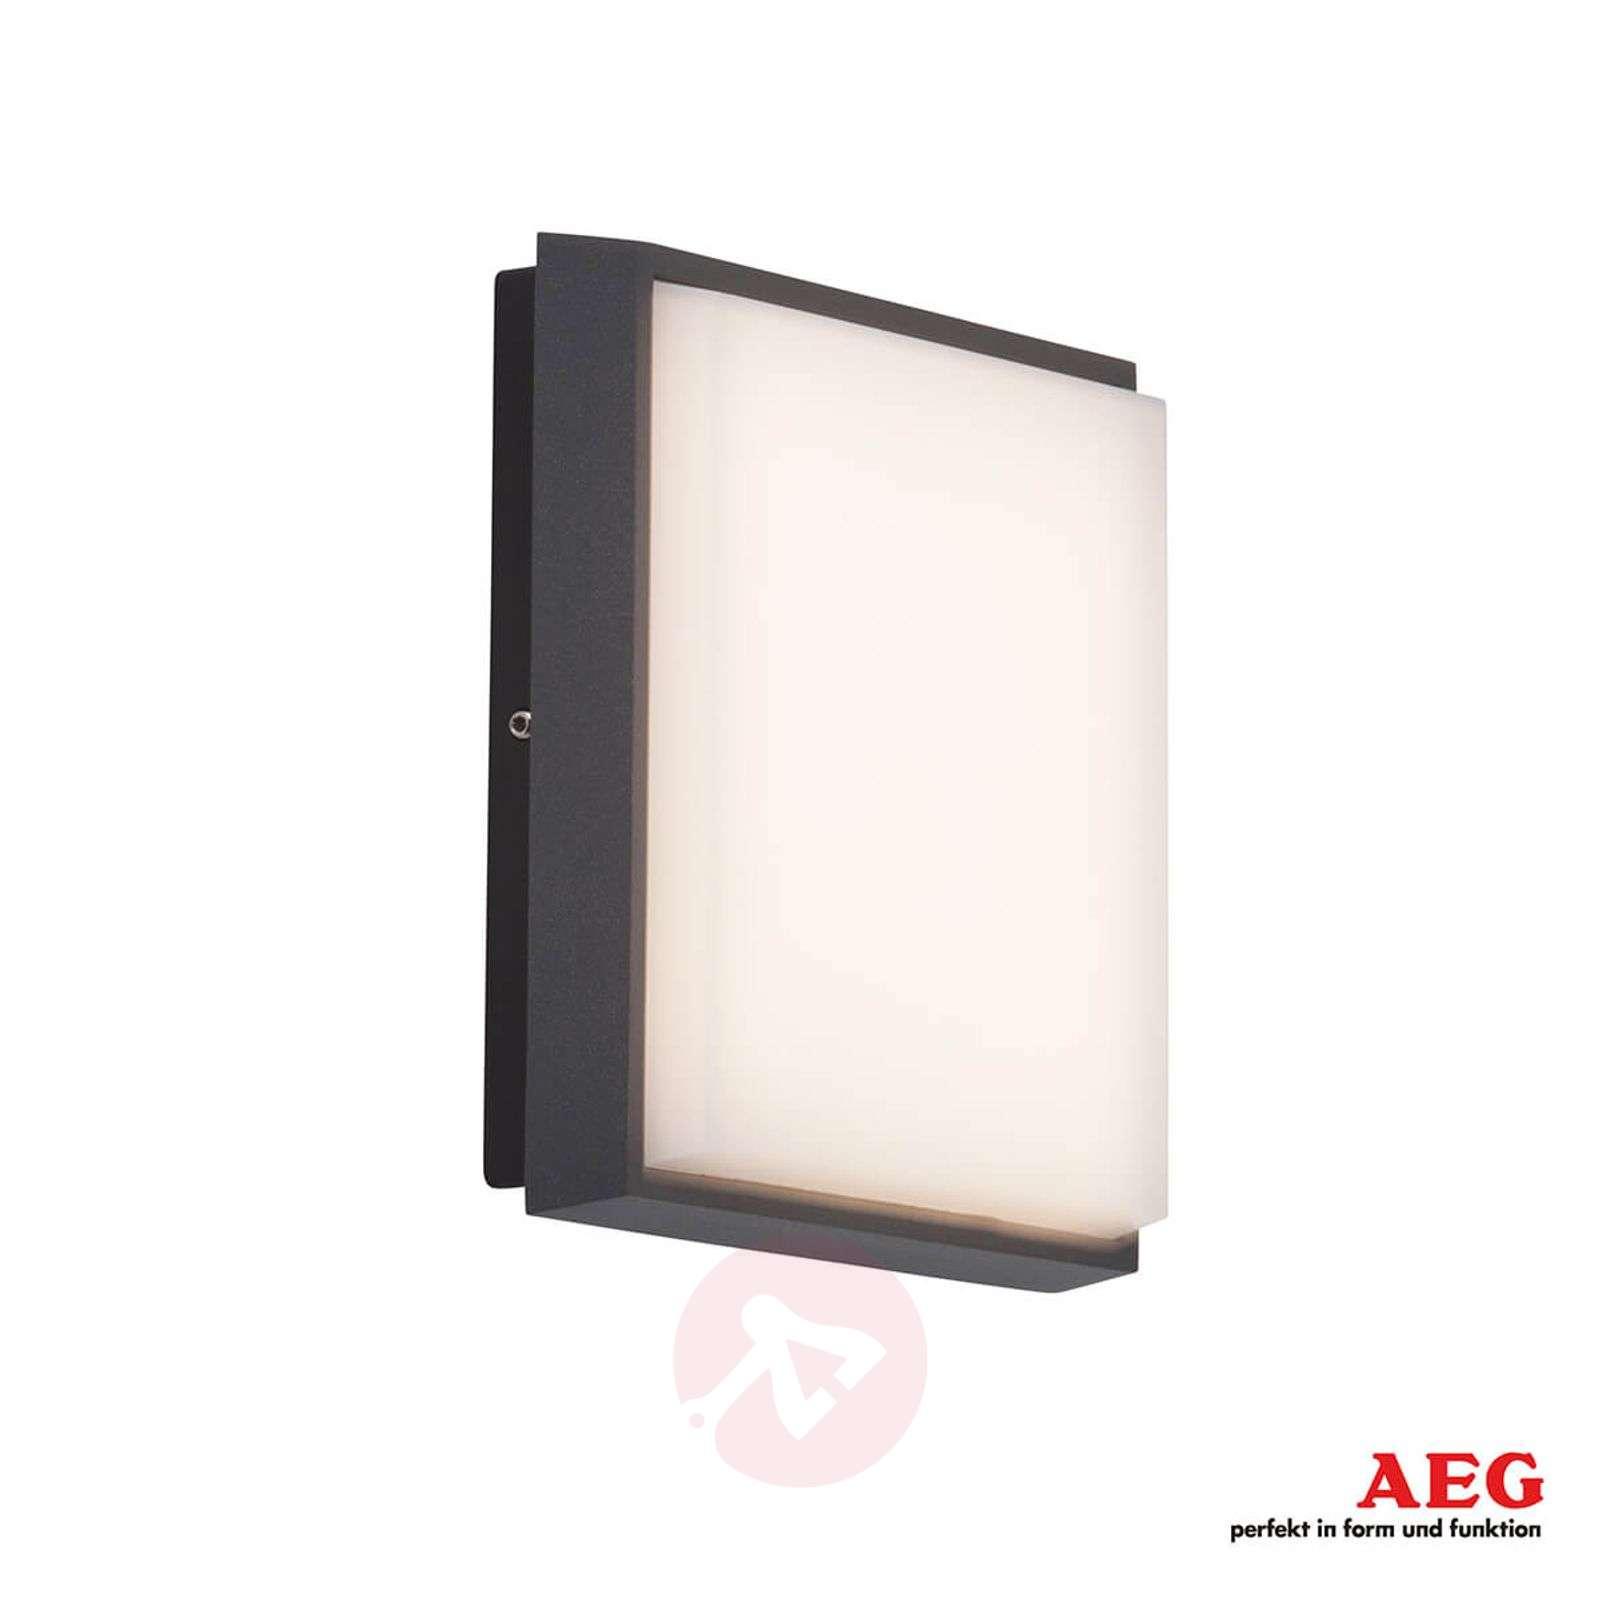 Kulmikas LED-ulkoseinälamppu Letan Square 9 W-3057117-01